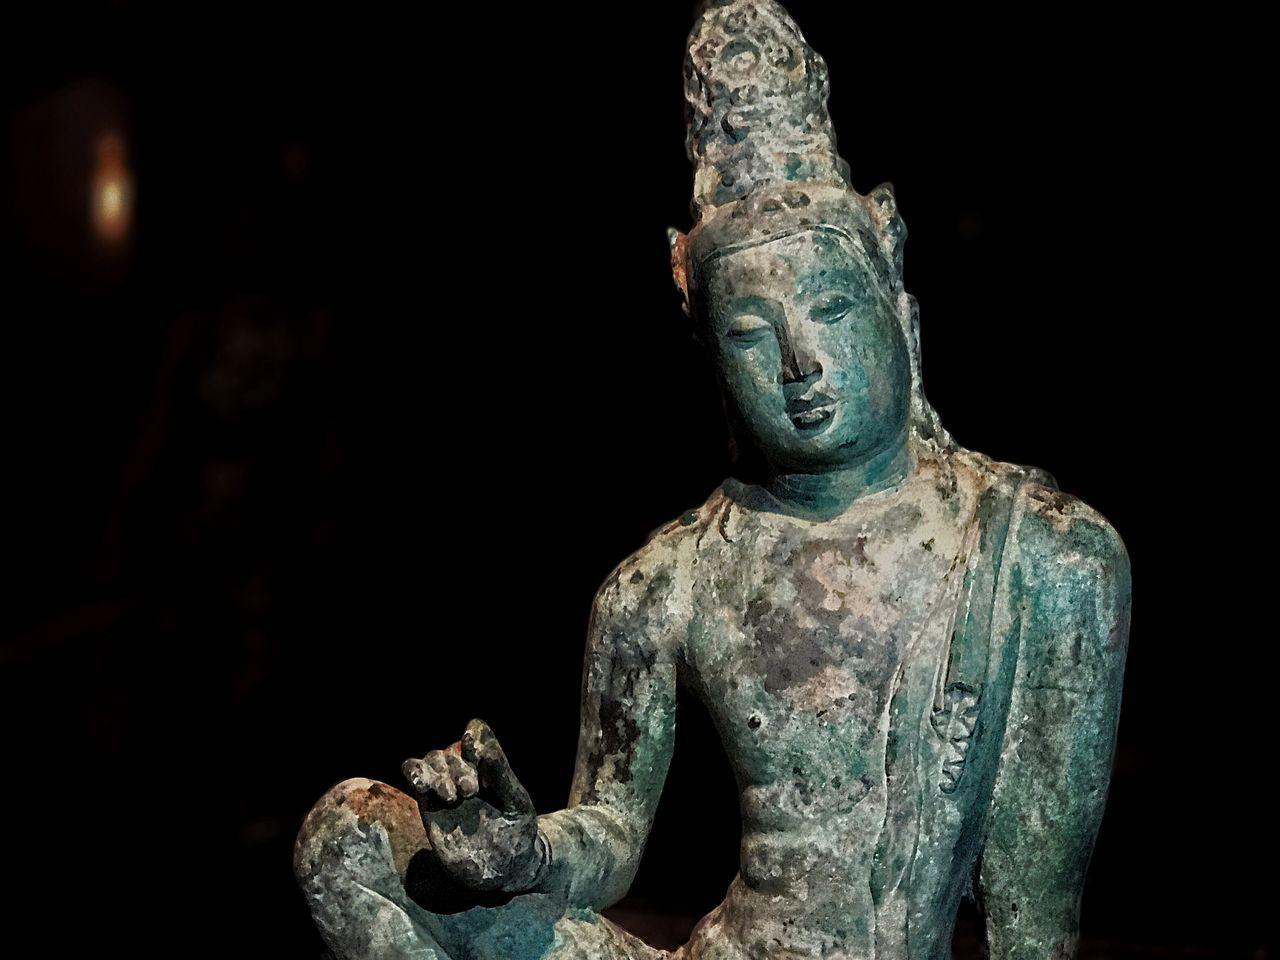 Statue Sculpture Human Representation Religion Spirituality No People Ancient Civilization Day